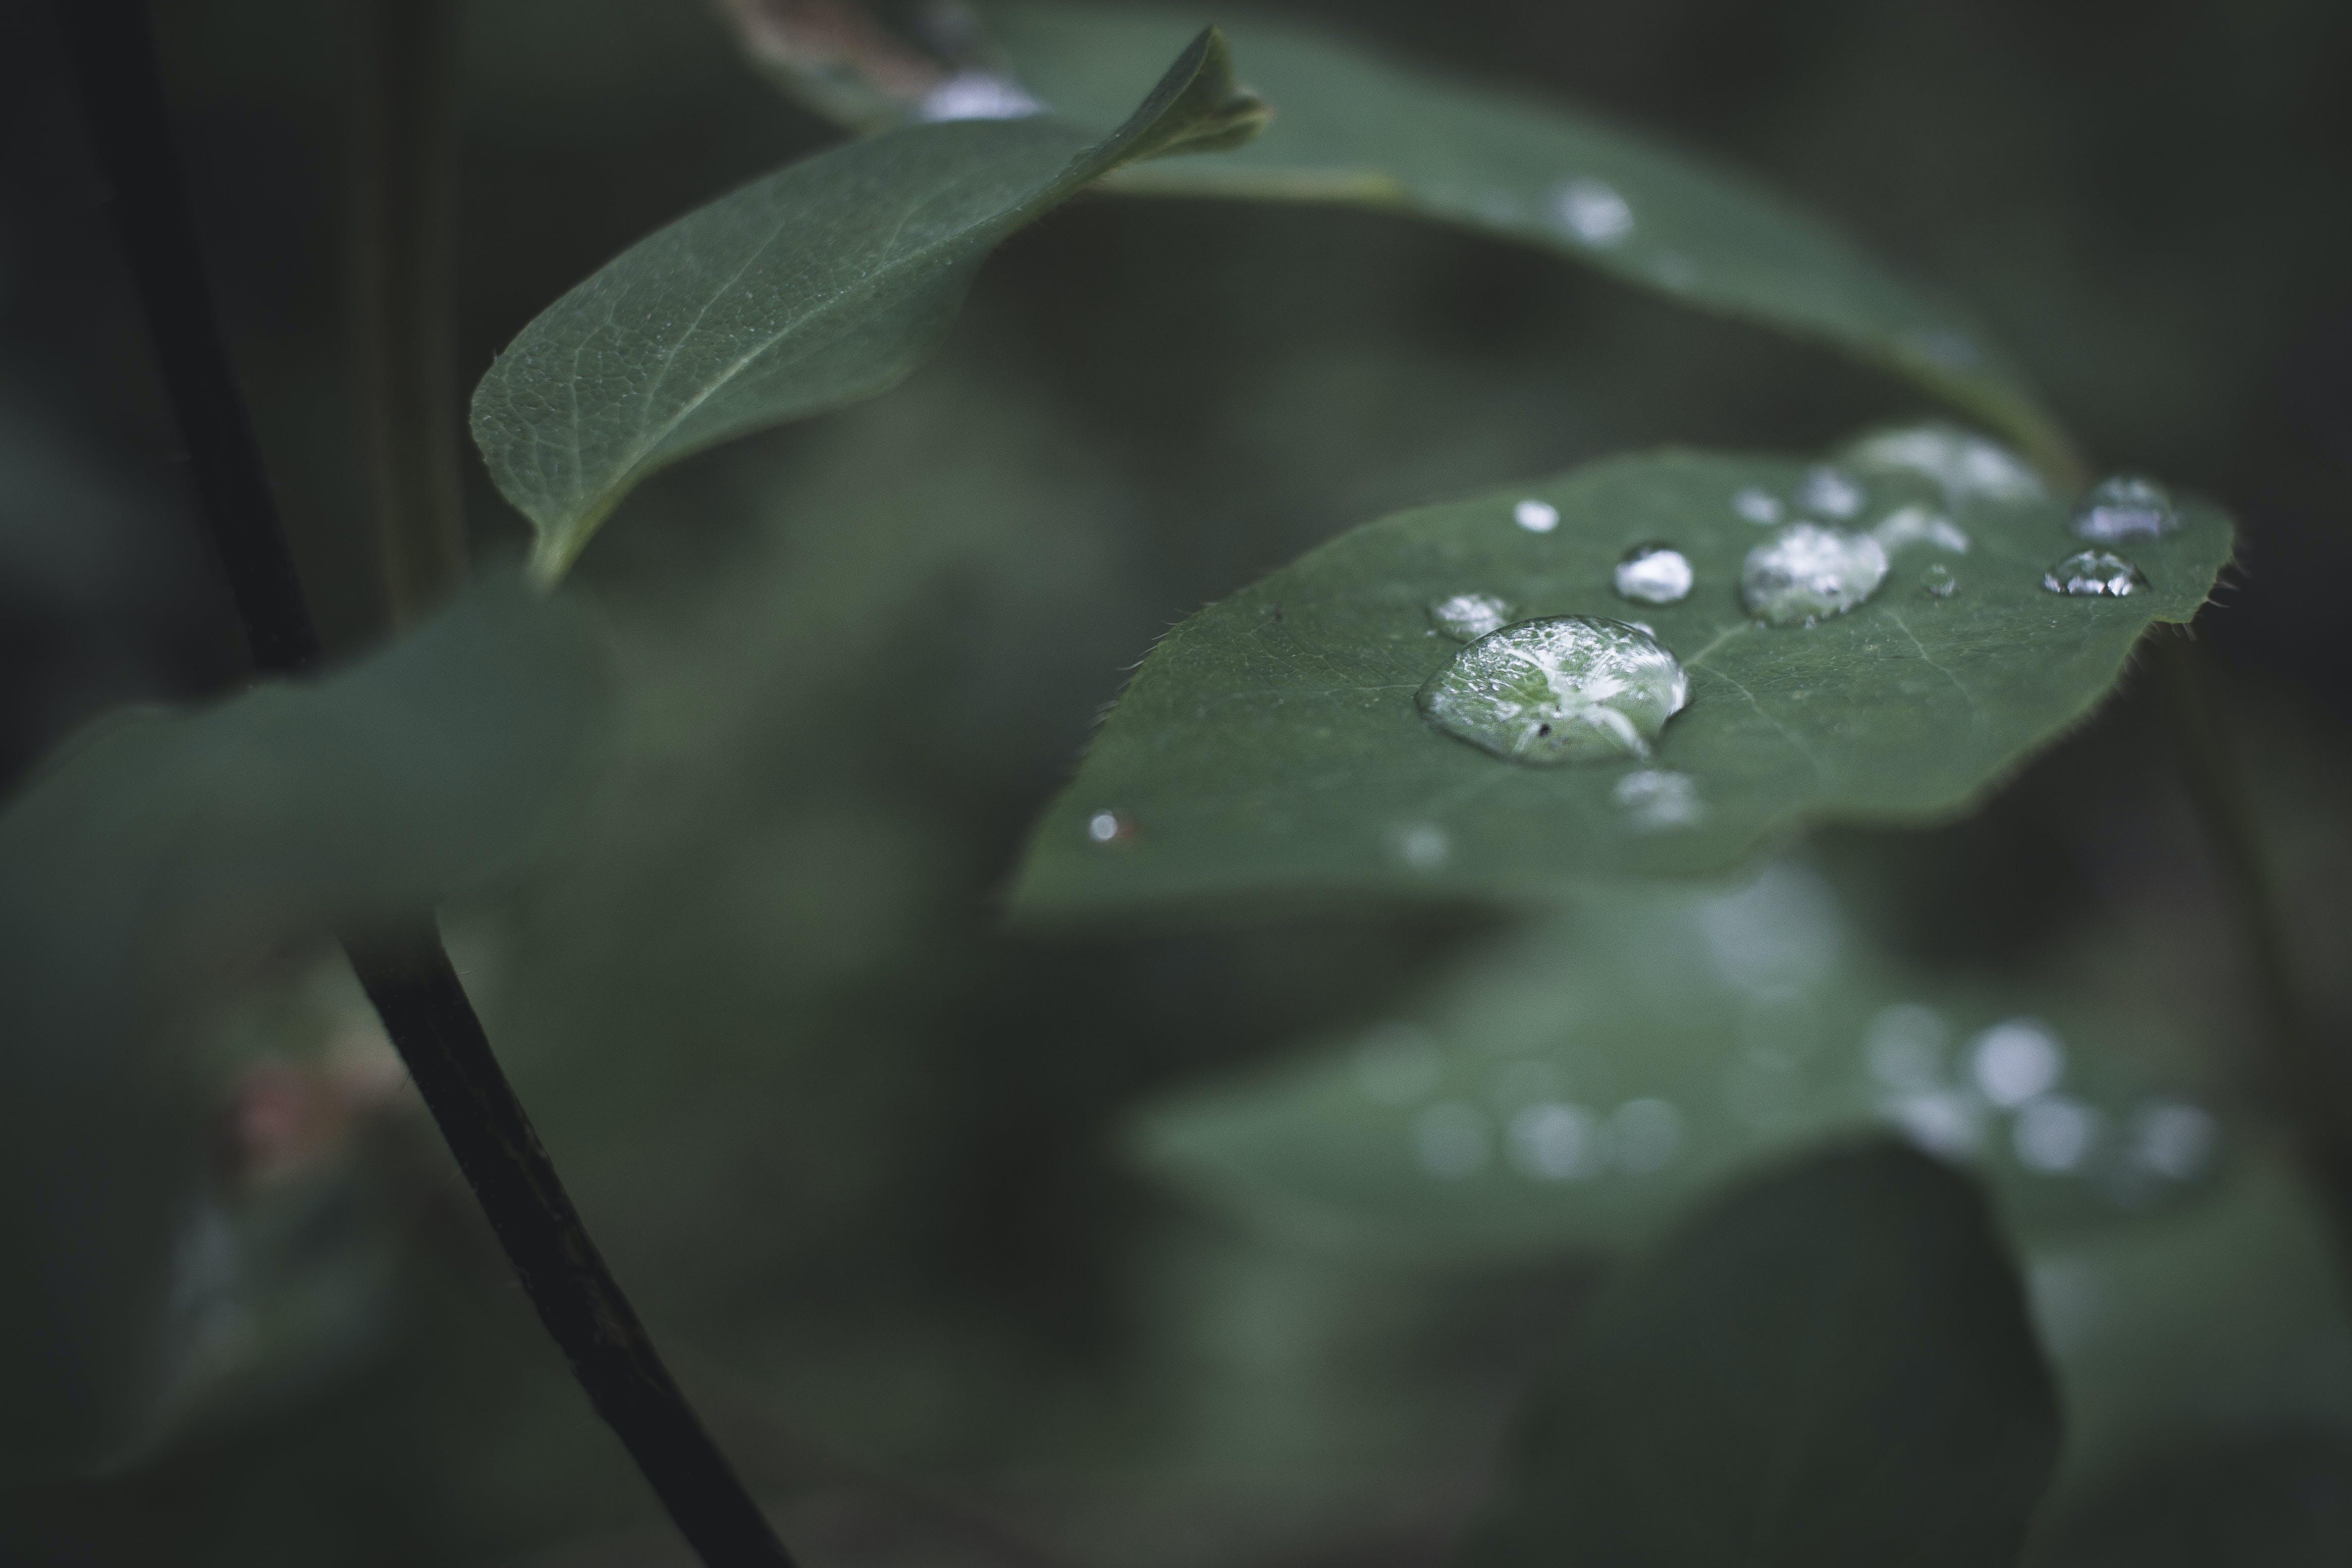 Free stock photo of drop, water